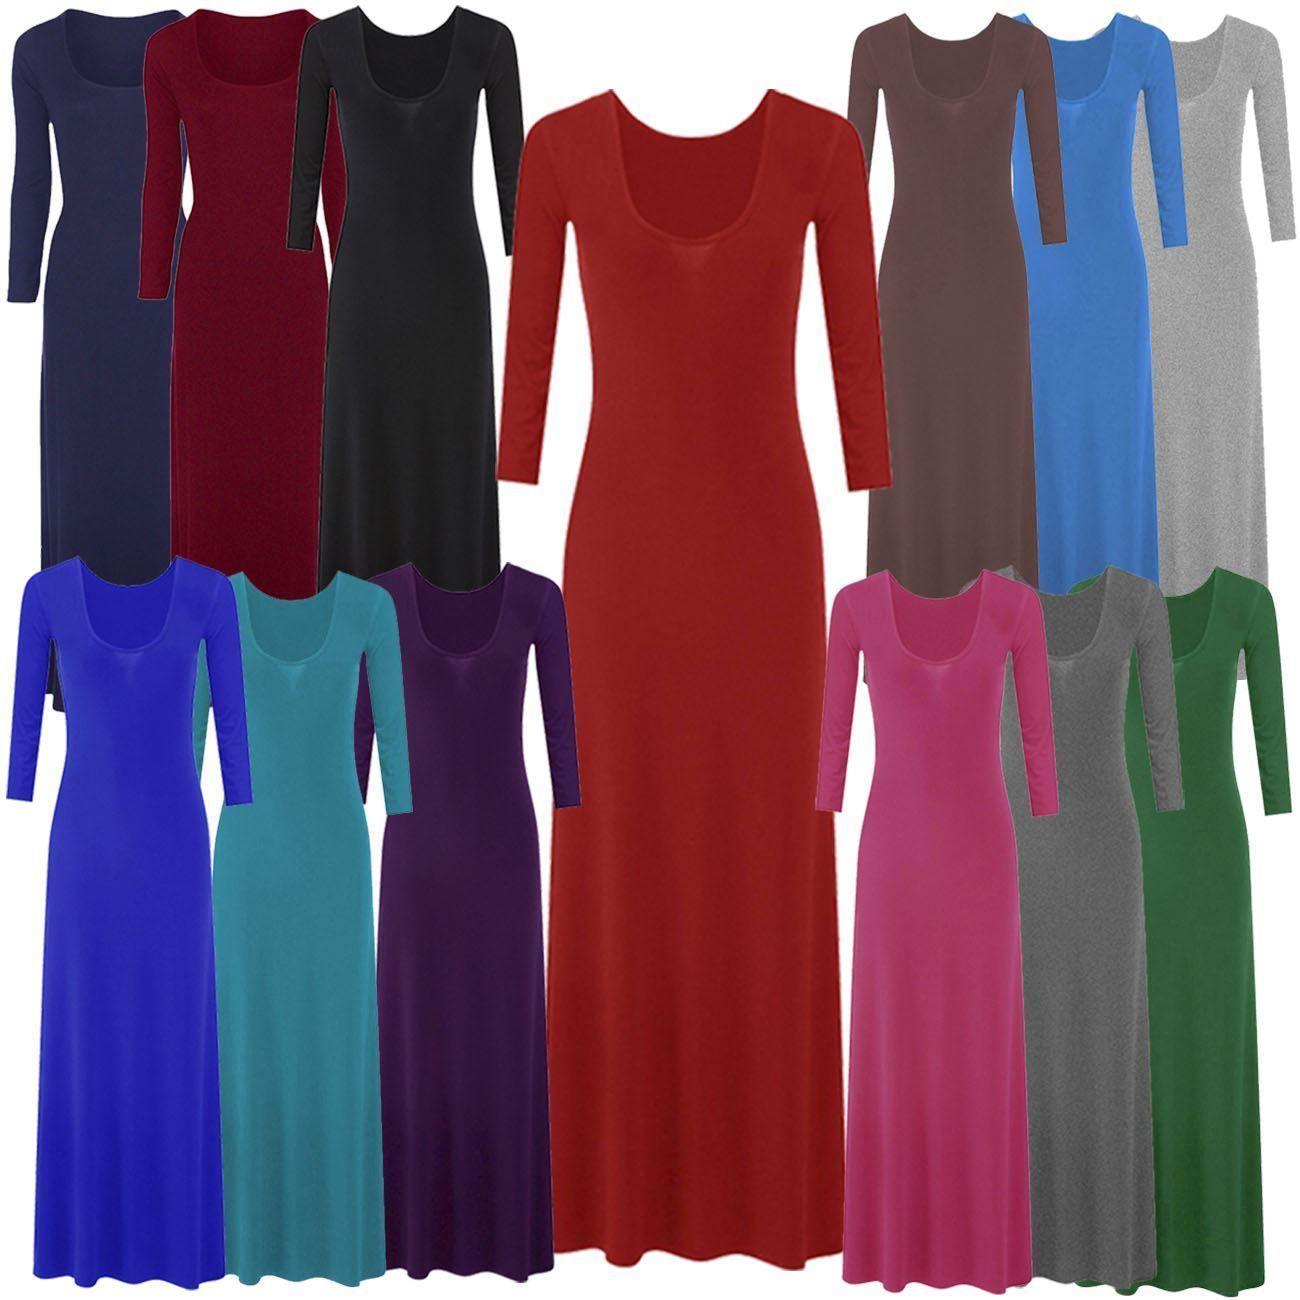 New ladies plus size sleeve flared long maxi dress